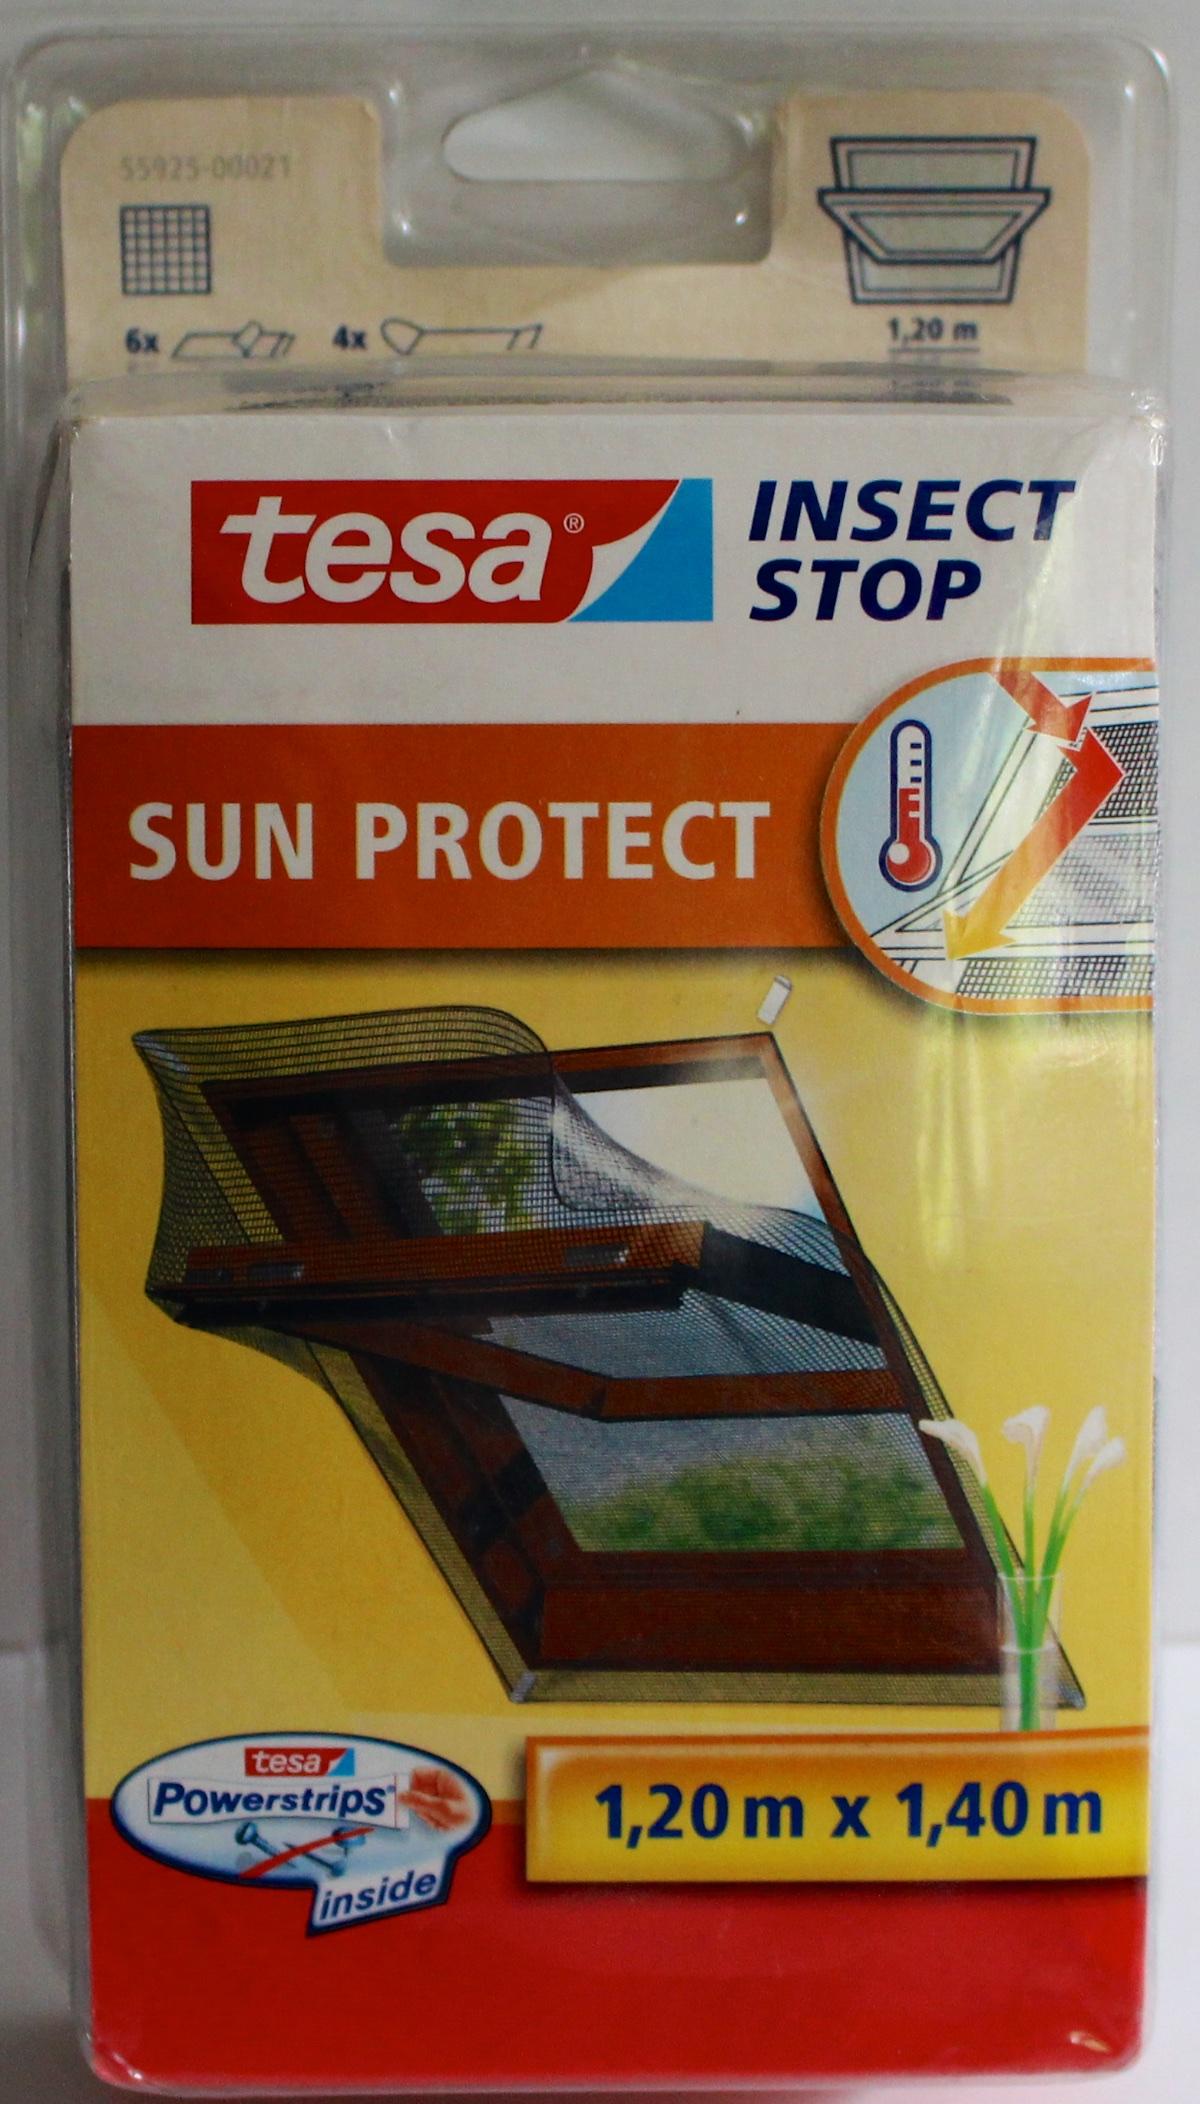 tesa sun protect dachfenster 1 20 x 1 40m sonnenschutz fliegengitter insect stop ebay. Black Bedroom Furniture Sets. Home Design Ideas